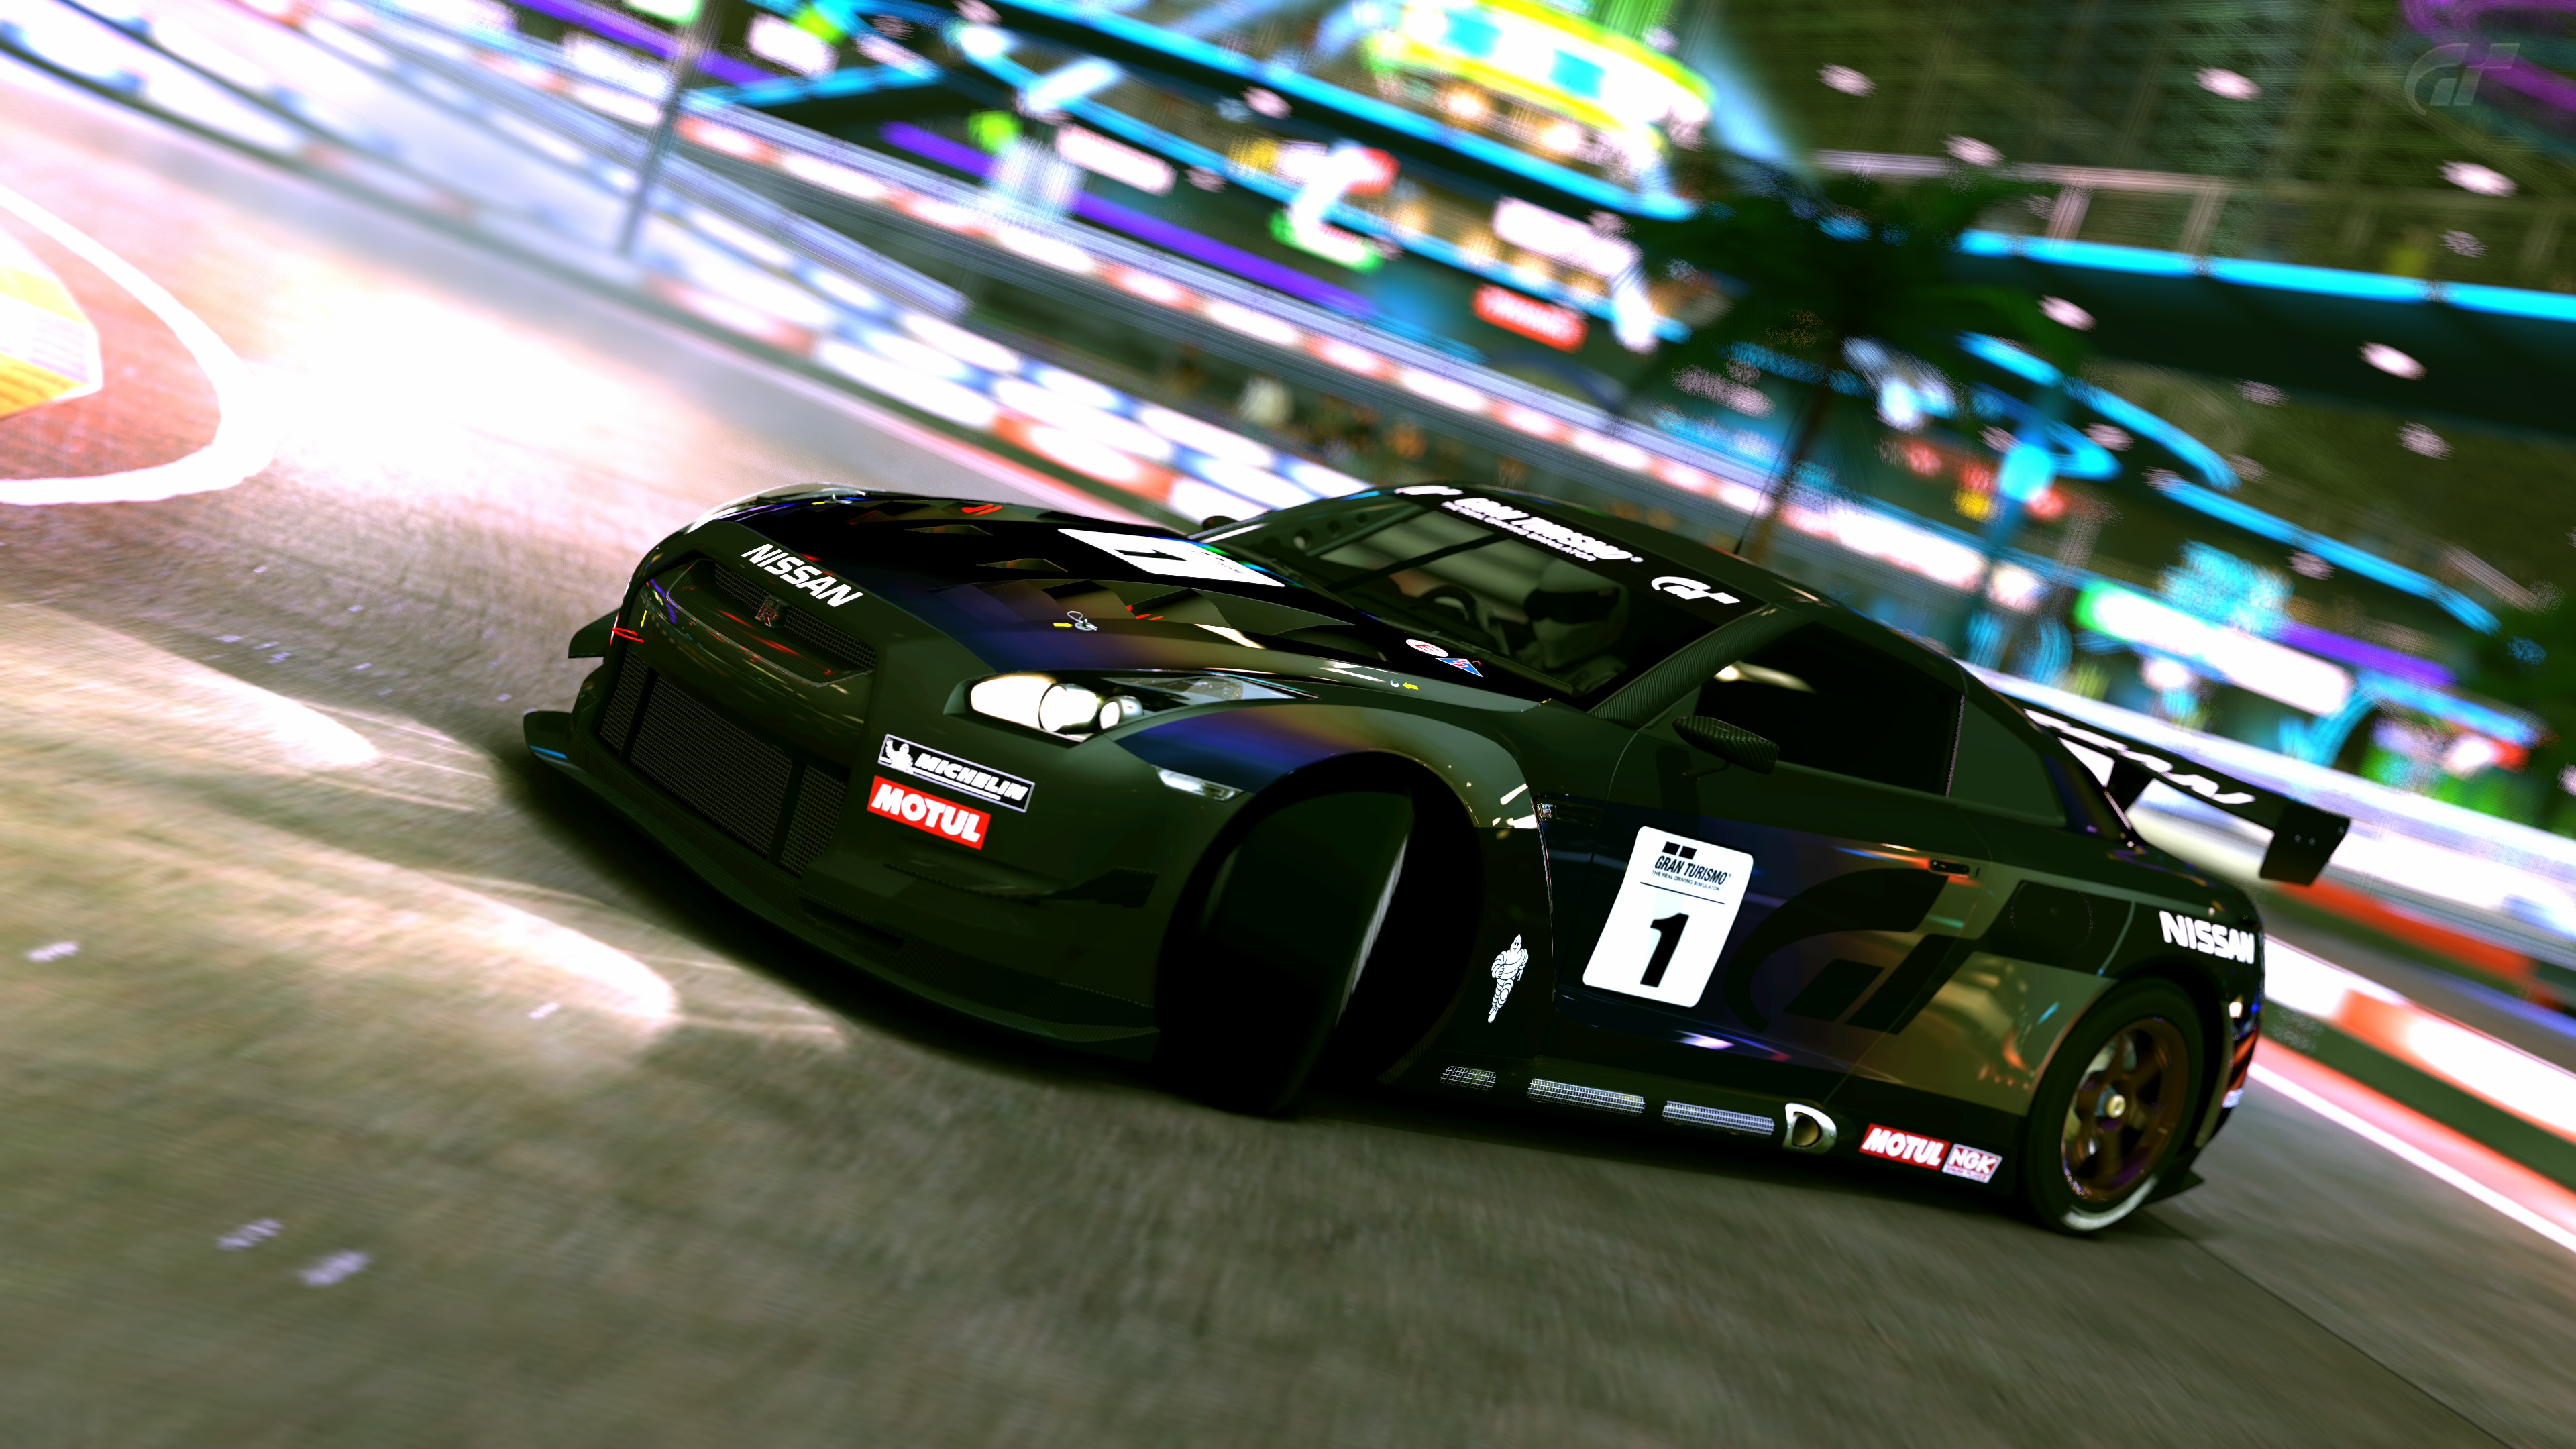 Nissan gtr drift wallpaper 1080p hd - resize image mac ...